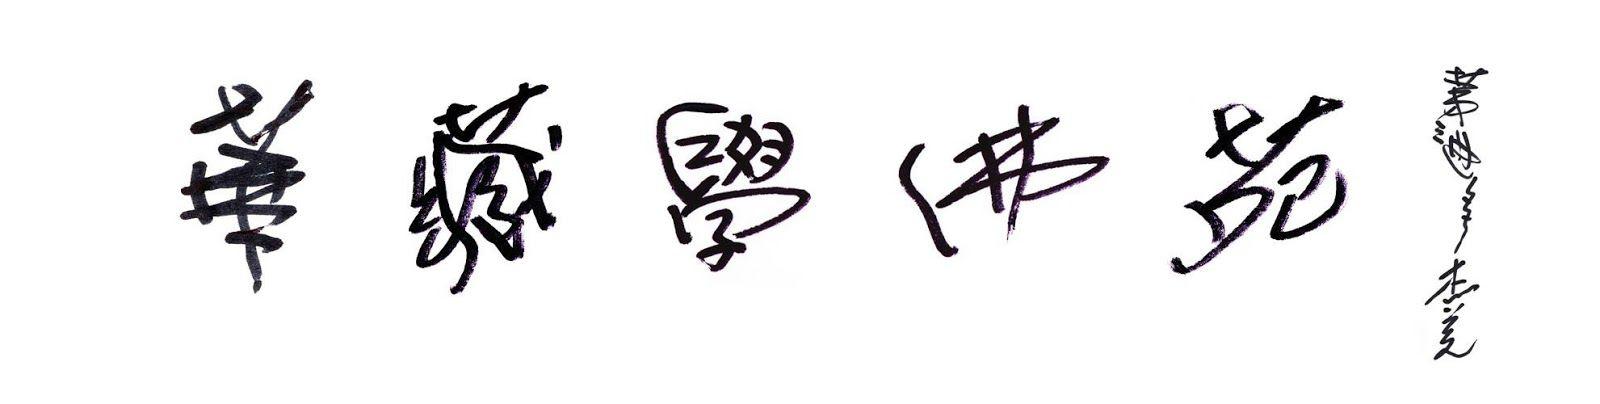 H.H.第三世多杰羌佛書法作品:華藏學佛苑